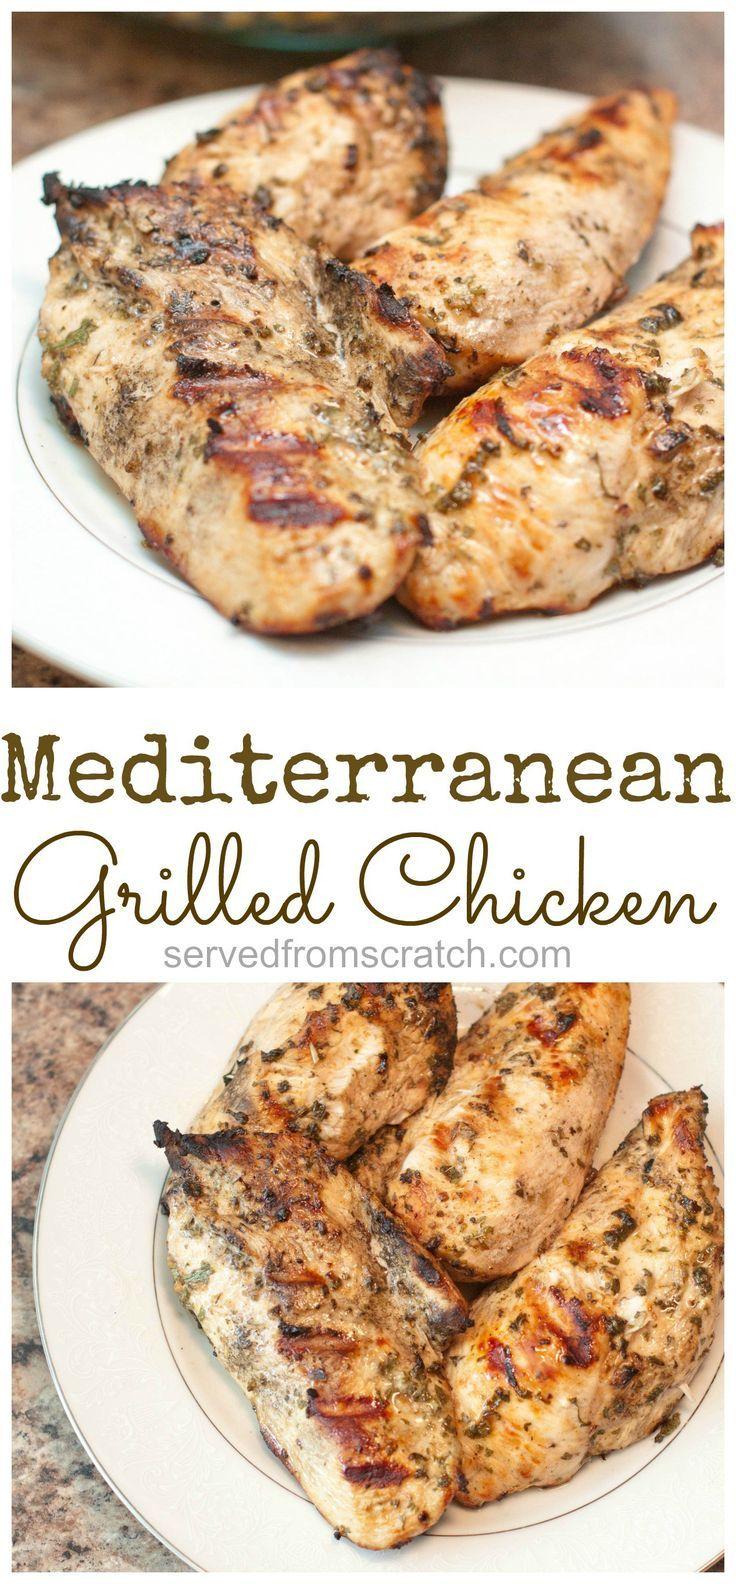 Super easy Mediterranean Grilled Chicken BreastsLynn | The Road to Honey